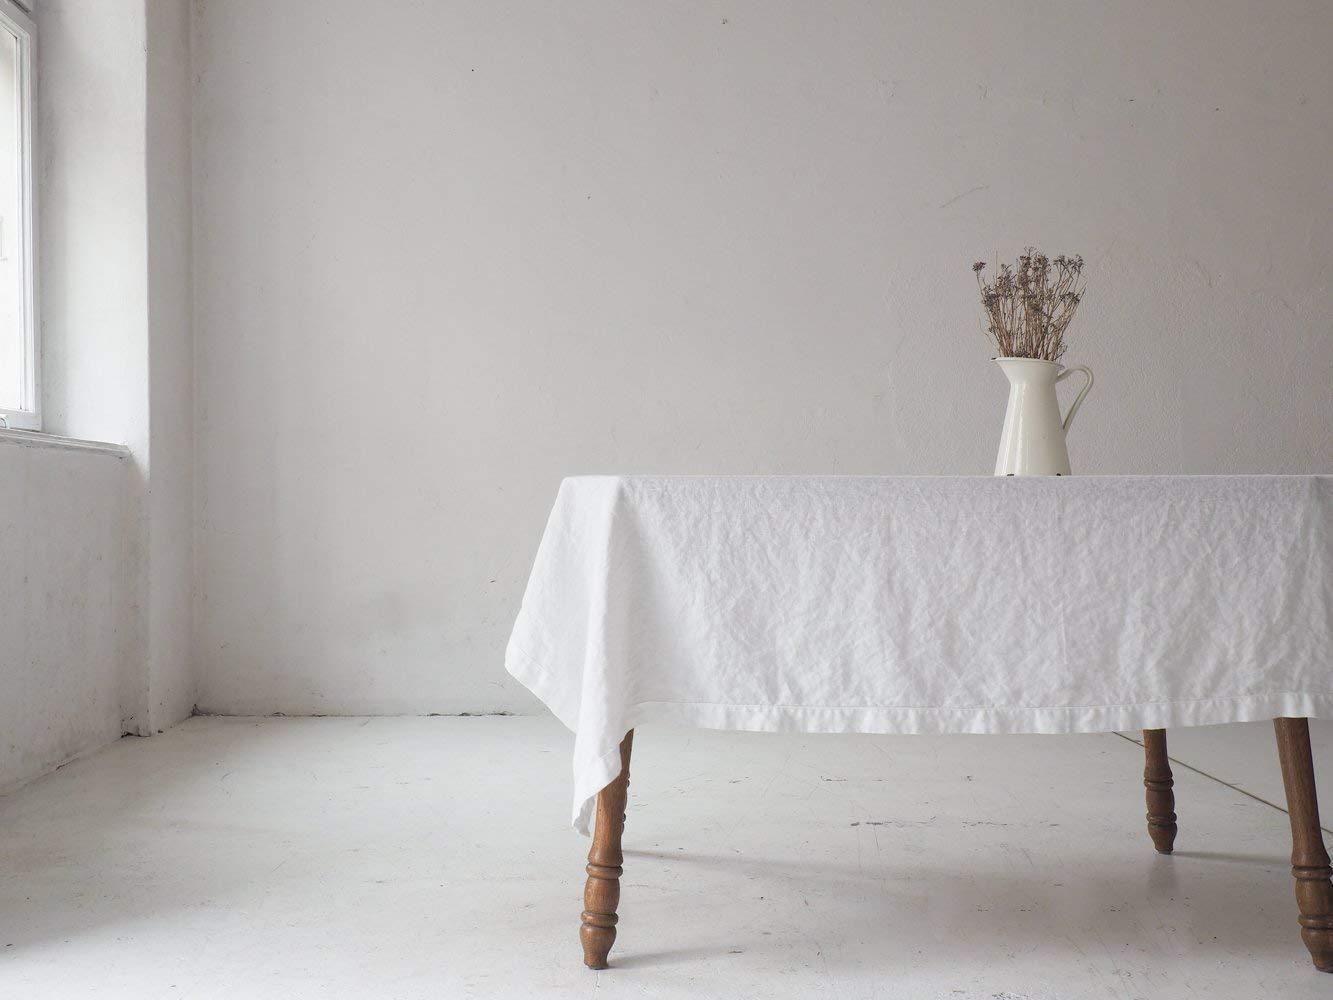 White linen tablecloth made of 100% European linen. Wedding tablecloth. Rectangle tablecloth. ablecloth 55x102 | 55 x 86 | 55x118